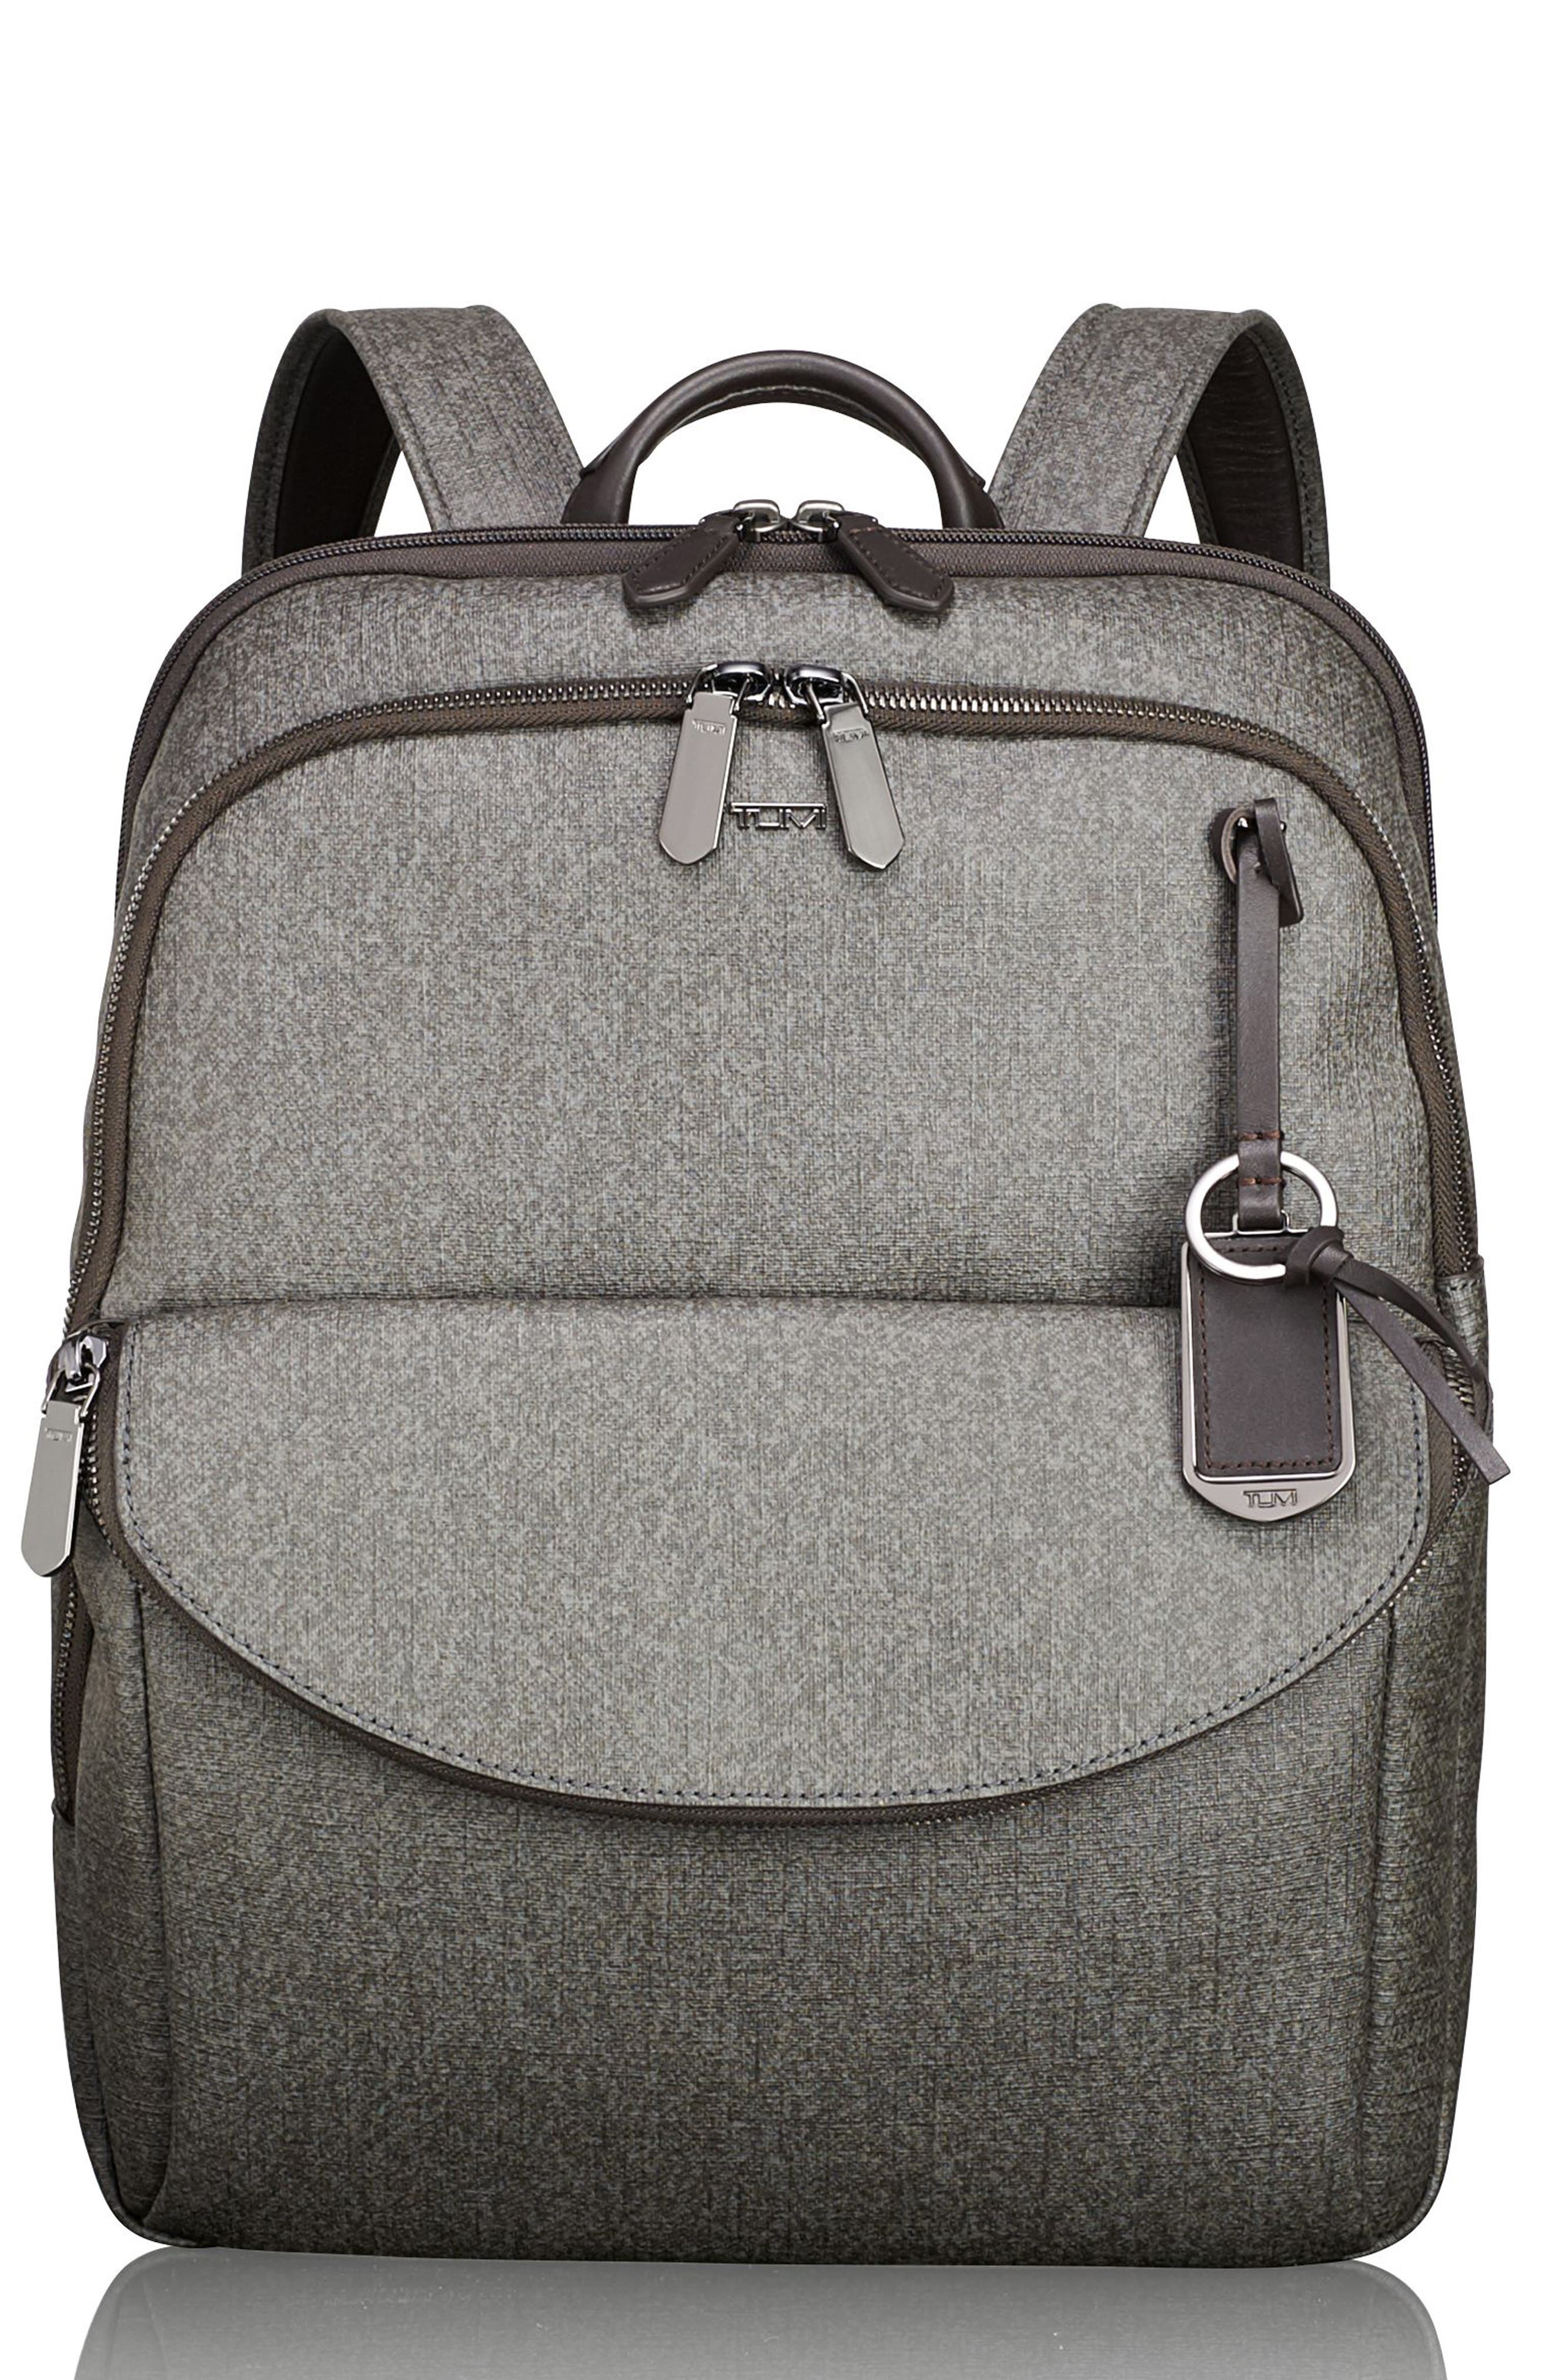 Main Image - Tumi Stanton – Hettie Coated Canvas Backpack